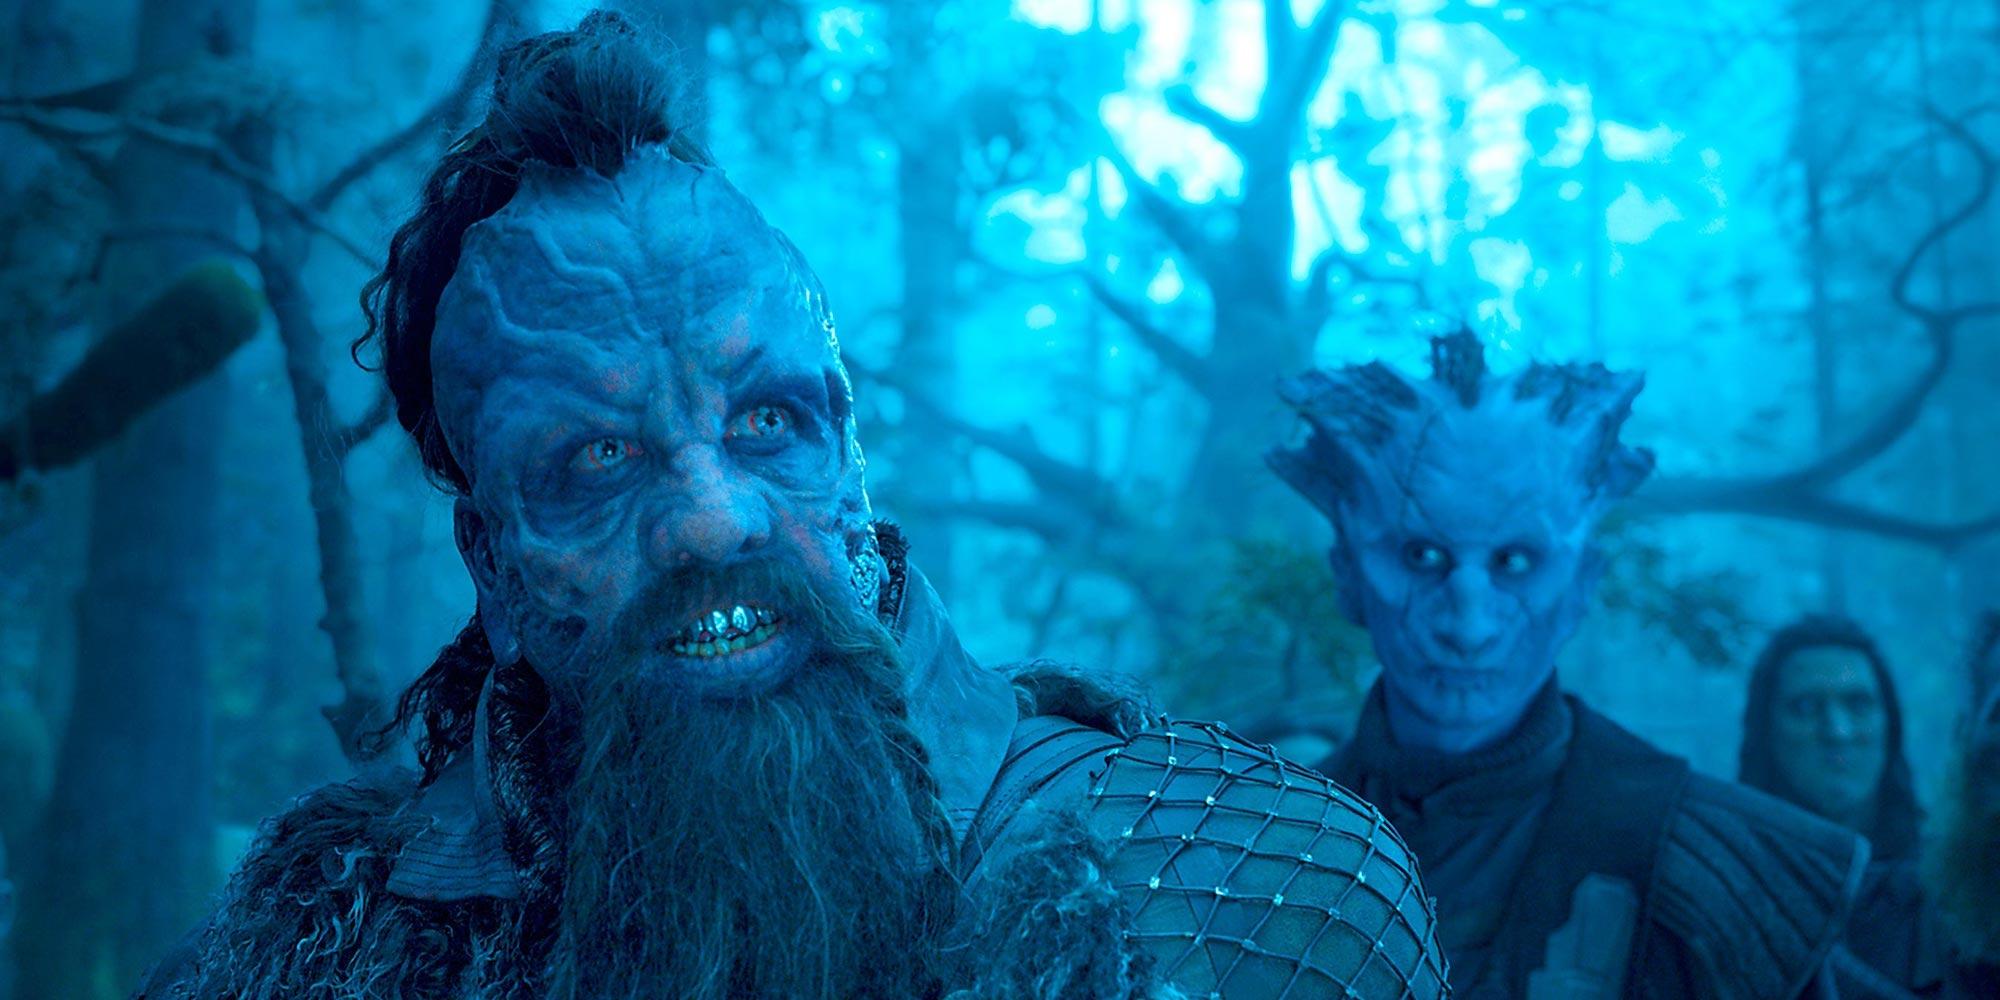 Hasil gambar untuk taserface guardians of the galaxy 2